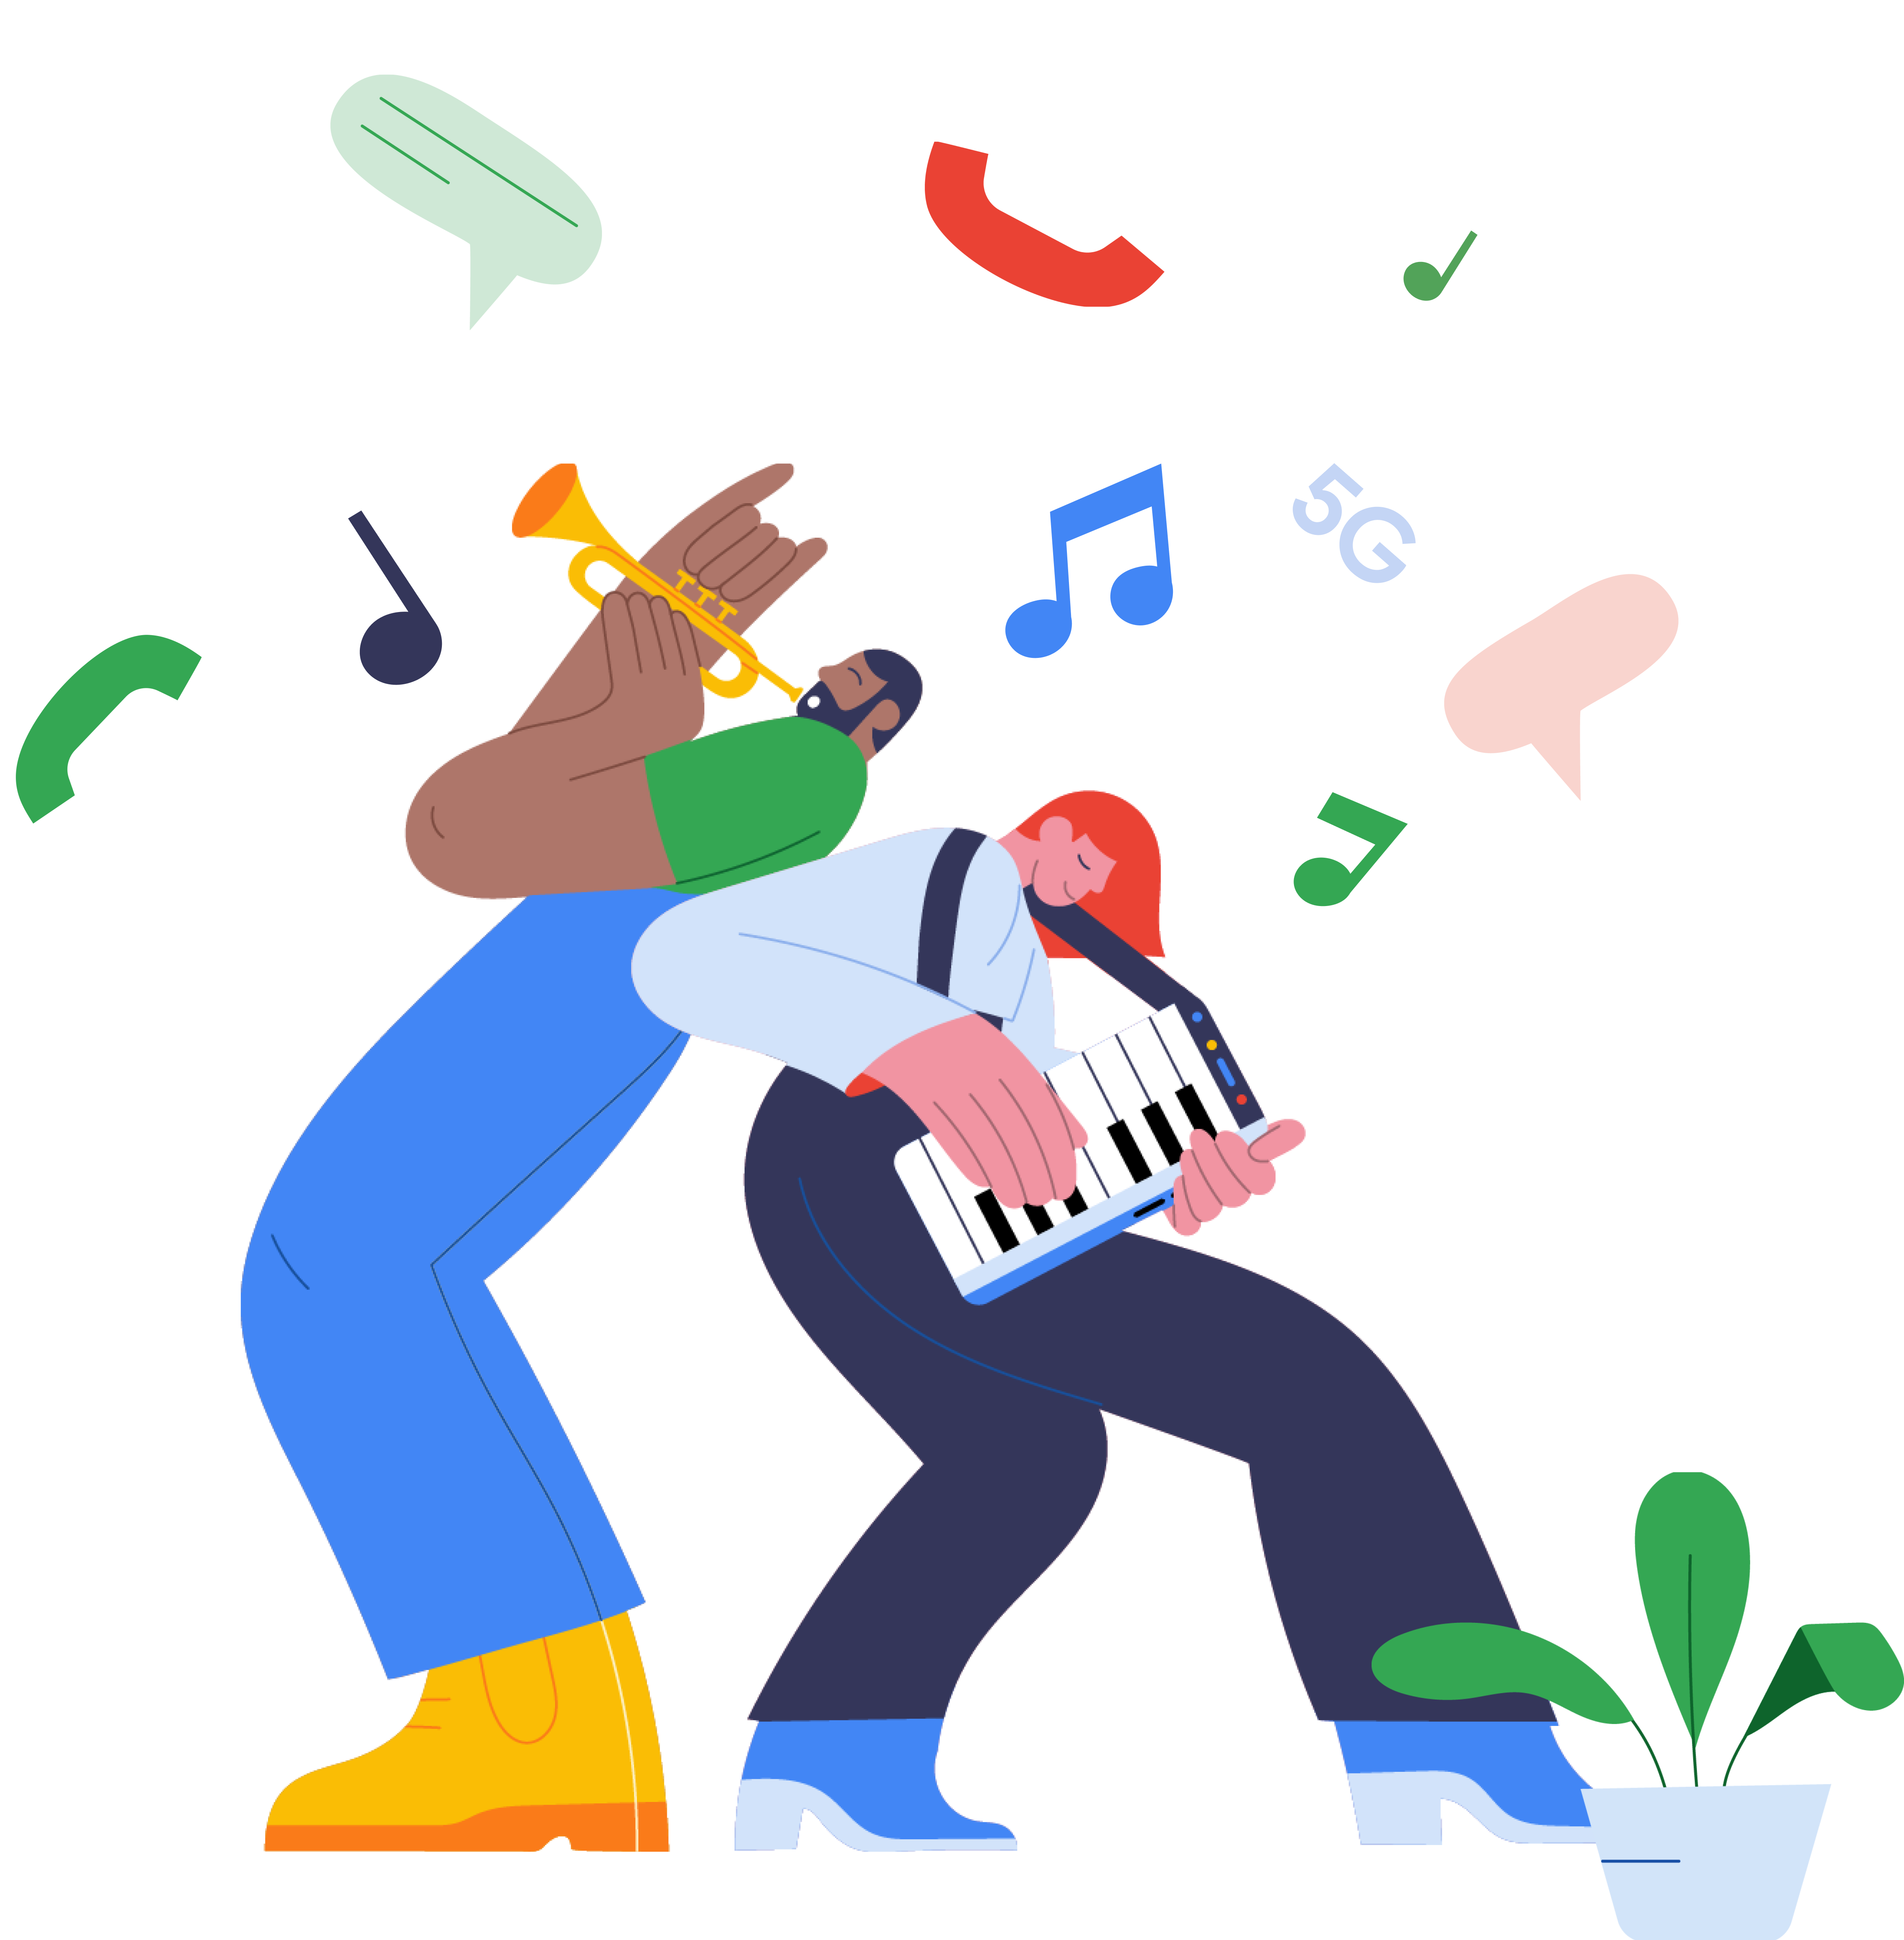 People playing music